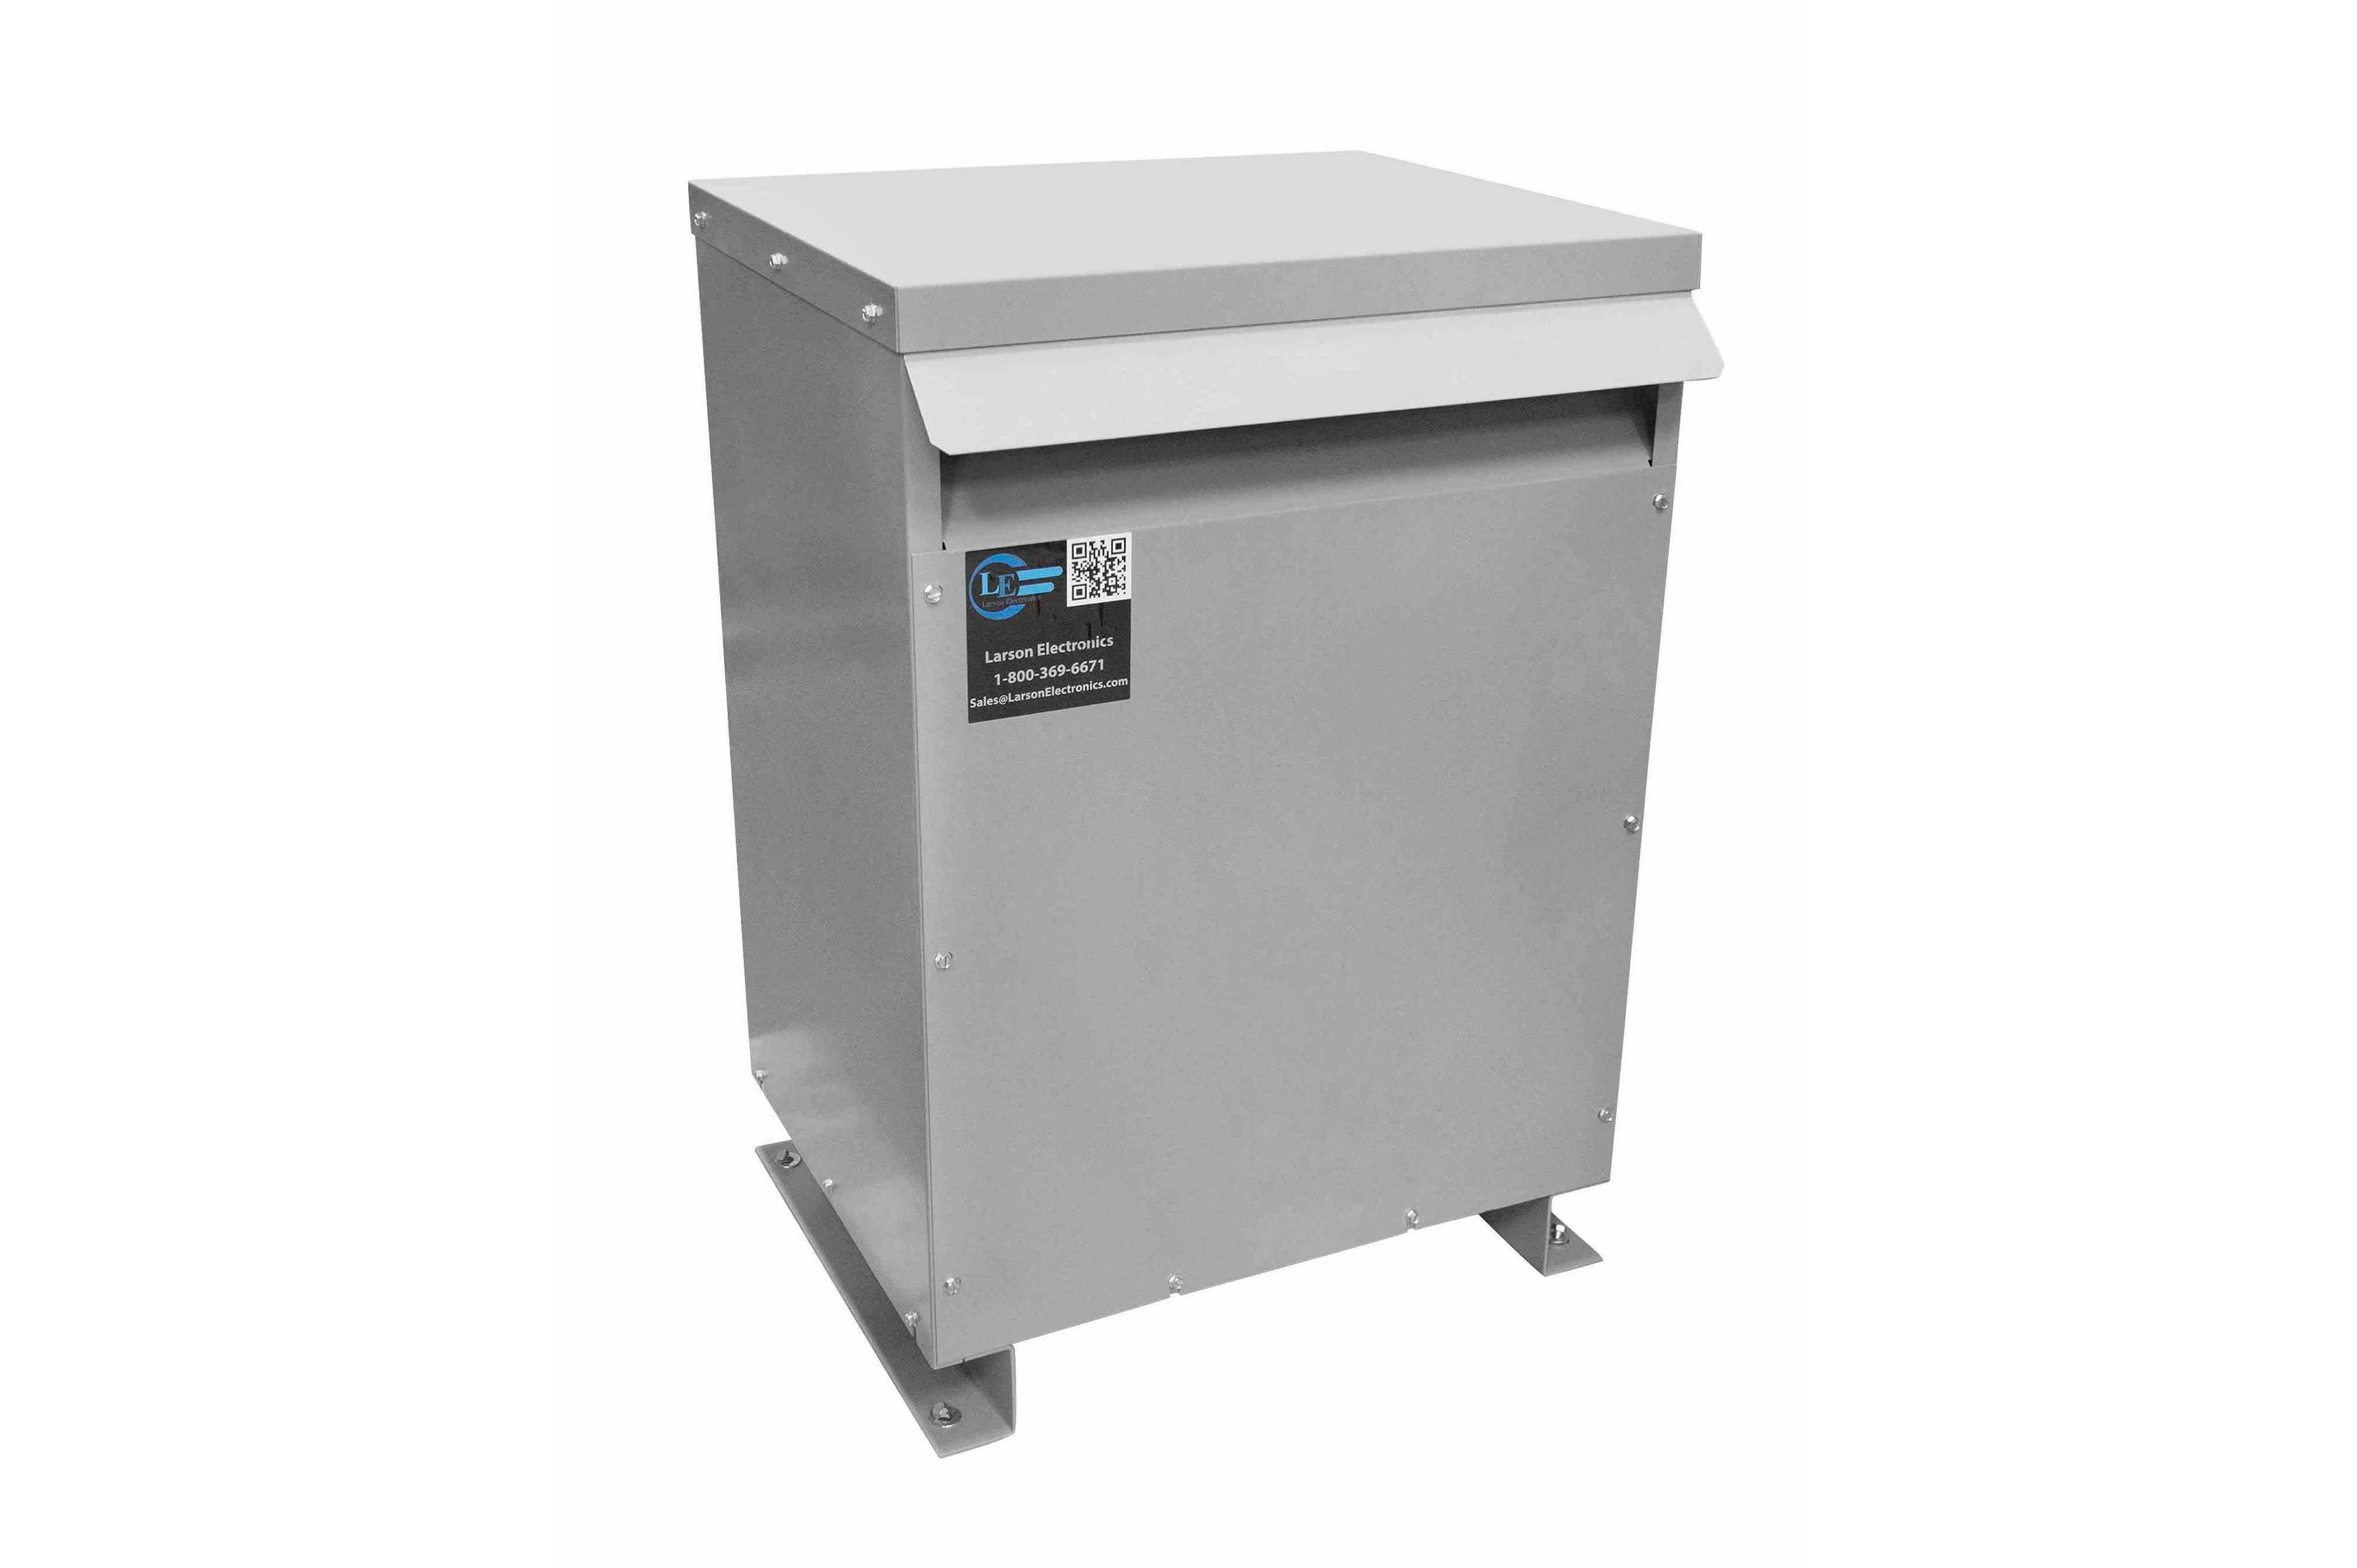 27 kVA 3PH Isolation Transformer, 600V Wye Primary, 240V Delta Secondary, N3R, Ventilated, 60 Hz